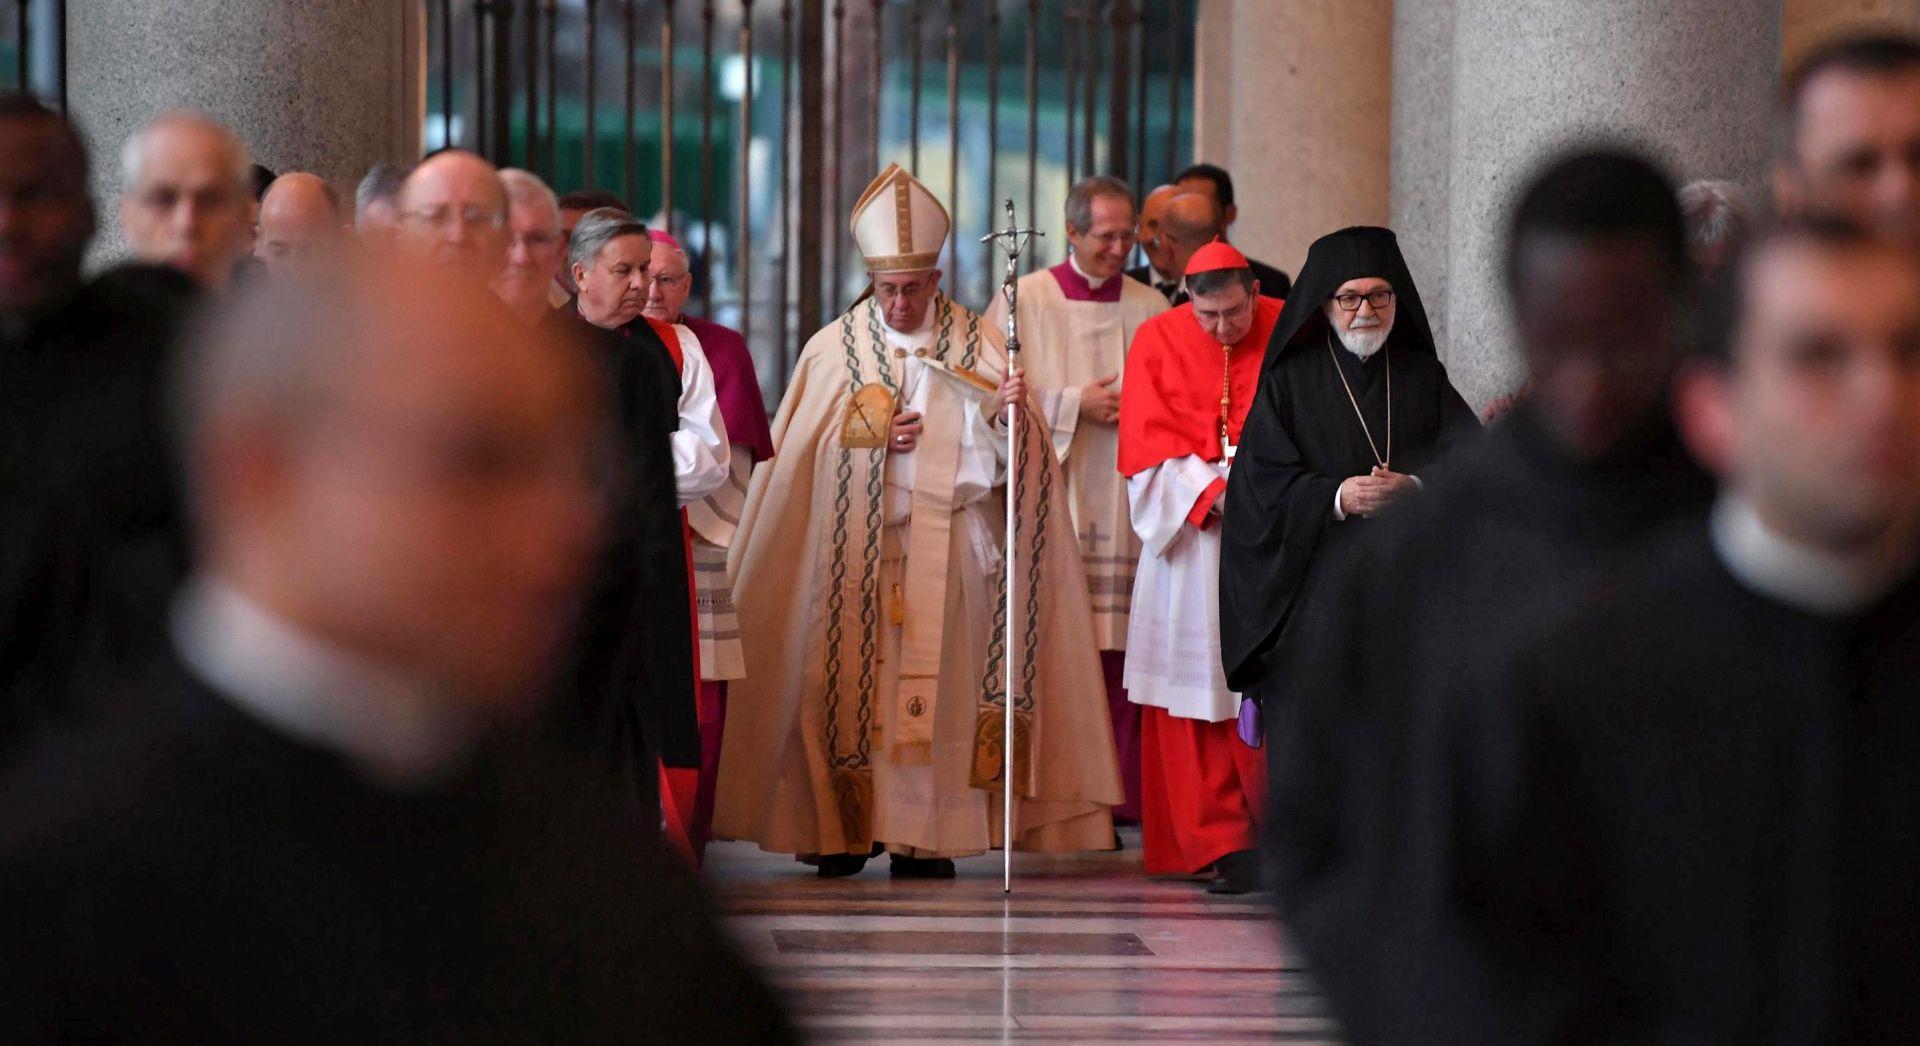 U Rimu se pojavili anonimni plakati s kritikama Pape